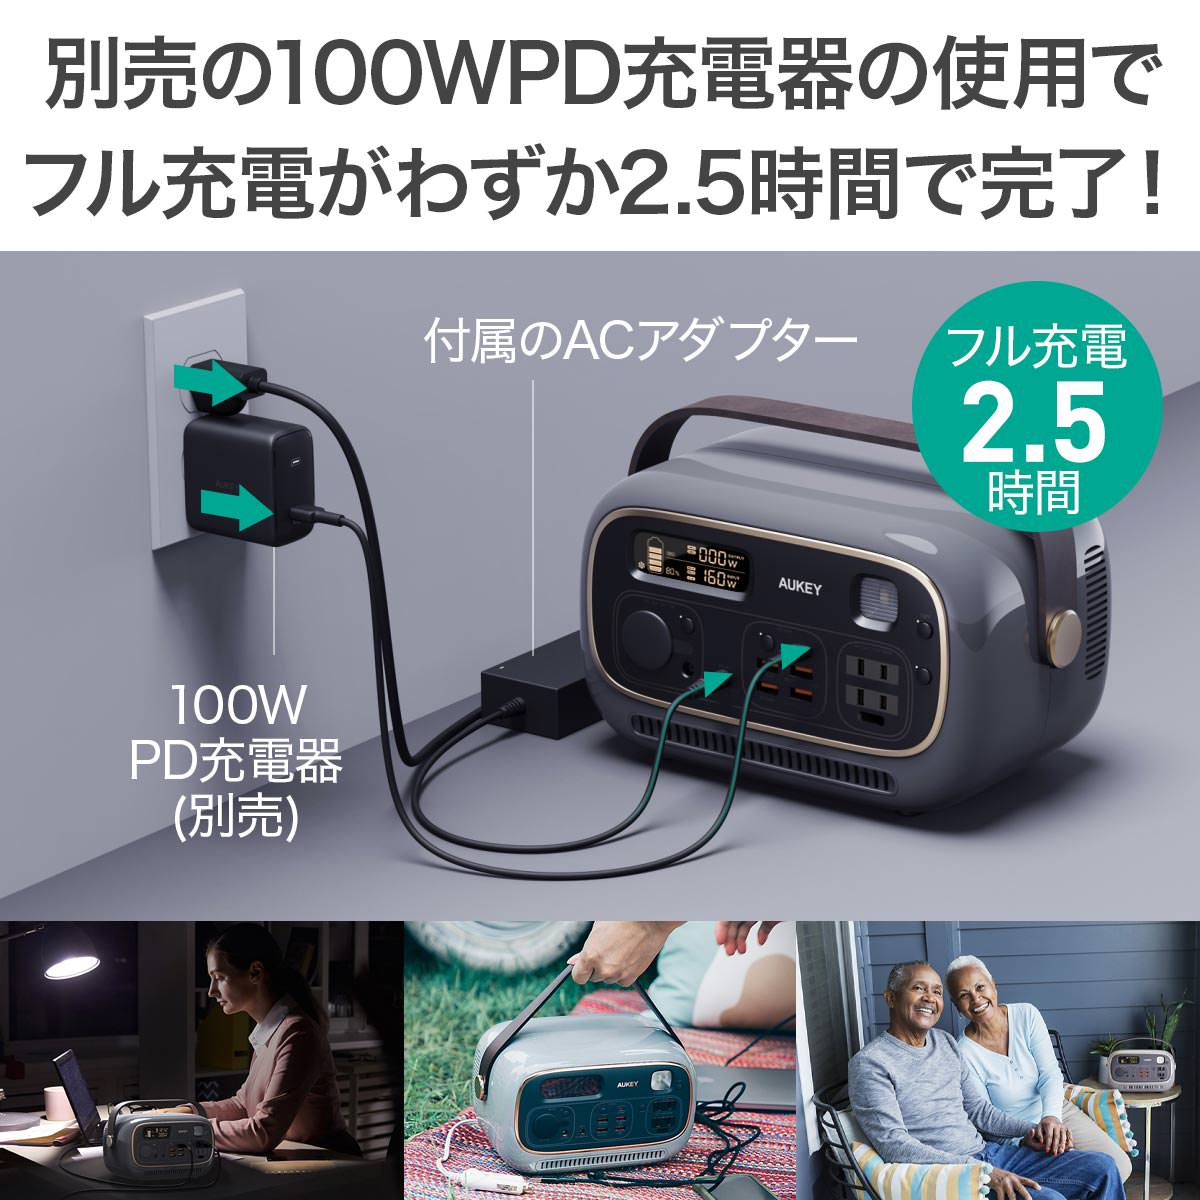 AUKEY、レトロな雰囲気の片手で持てるポータブル電源「PowerStudio」39,800円で発売 3